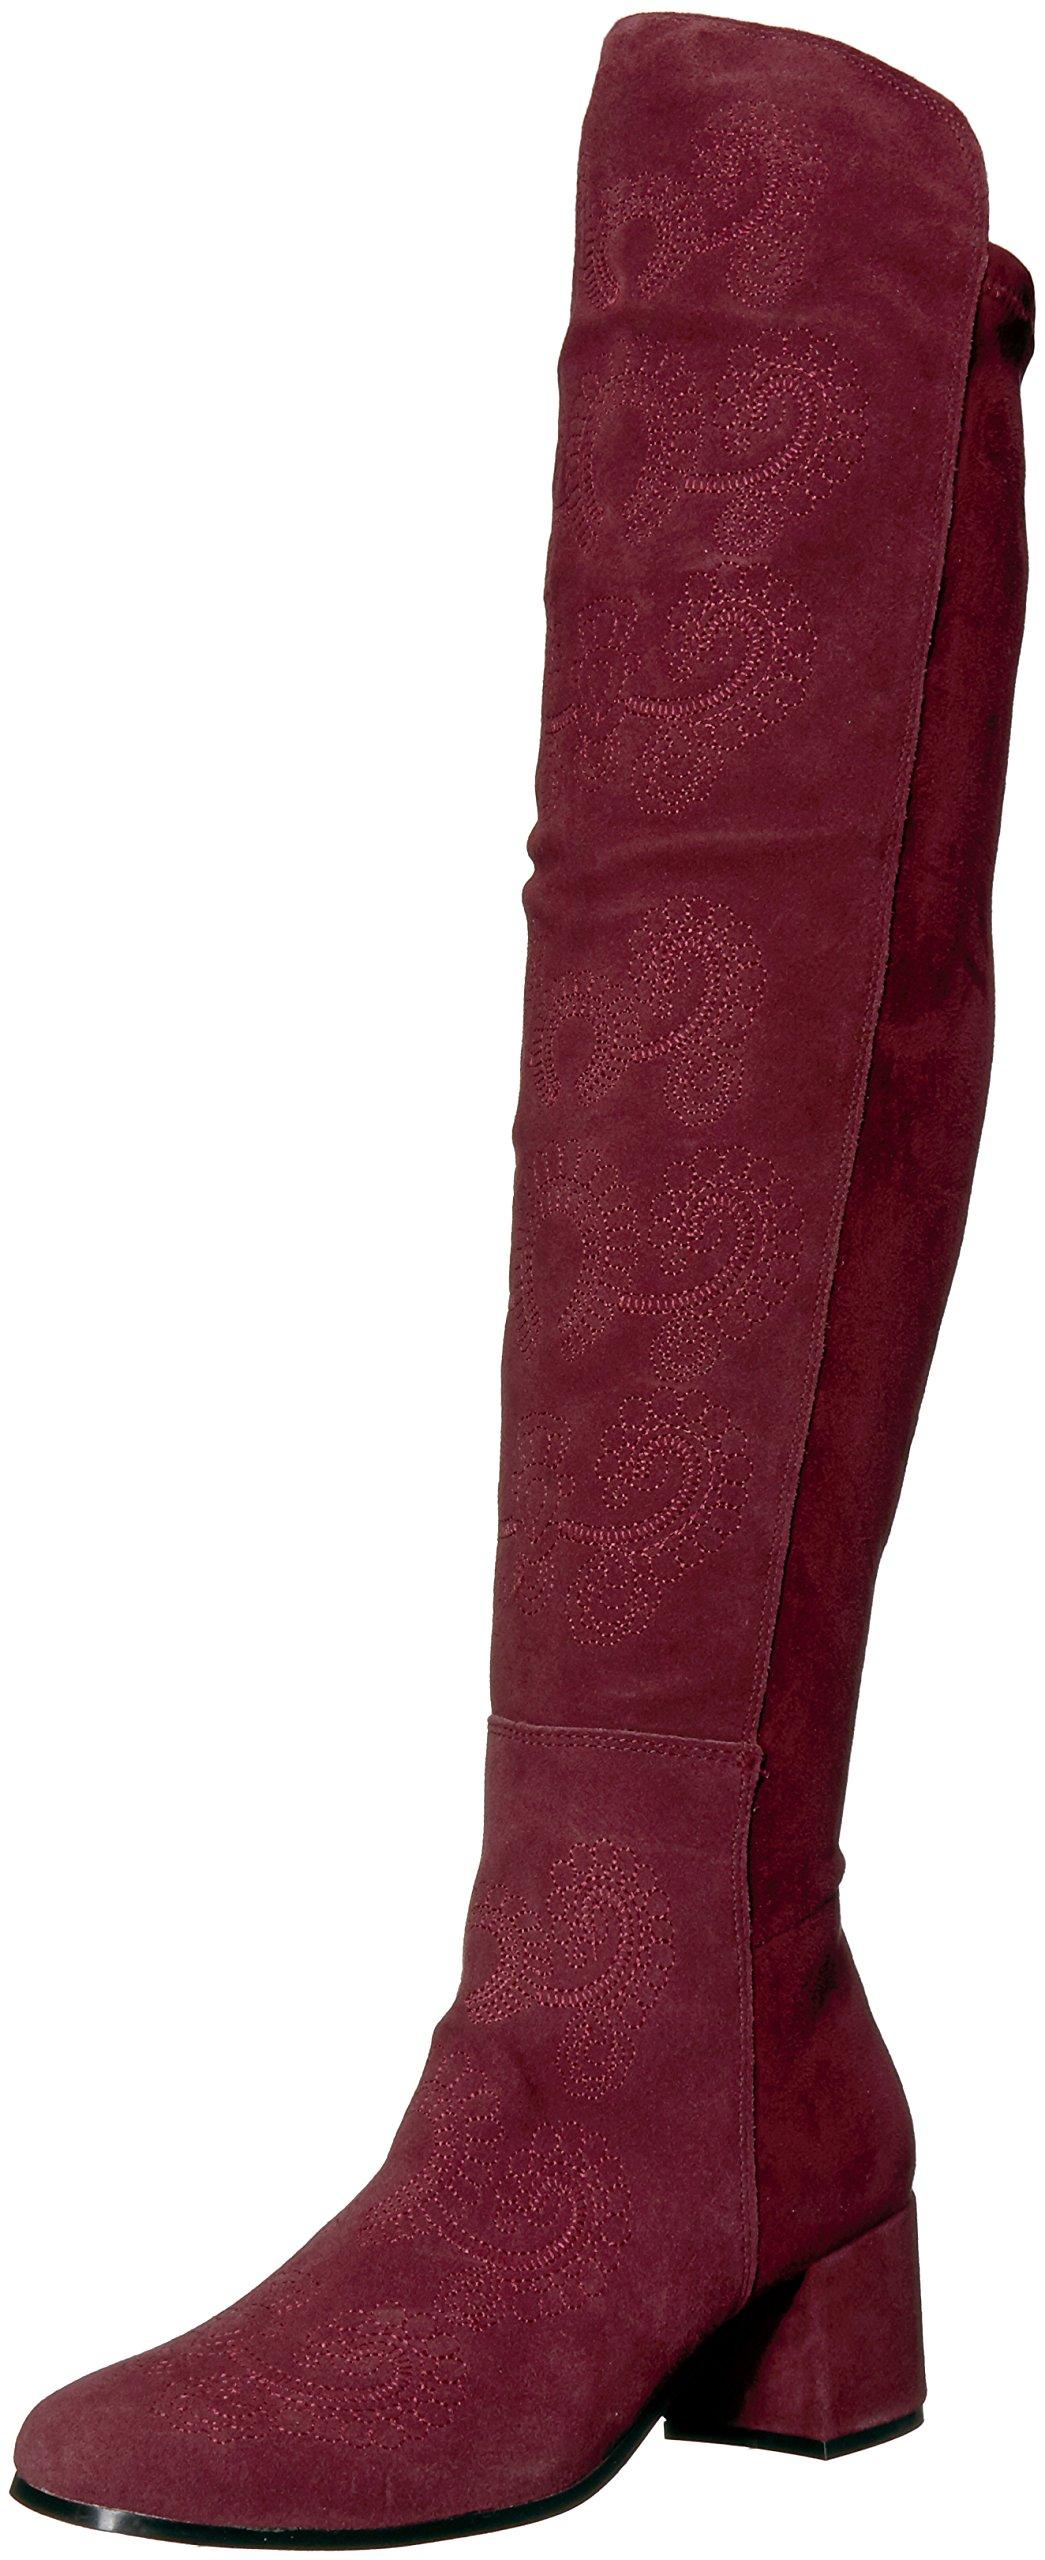 Sbicca Women's Chenoa Riding Boot, Wine, 7.5 B US